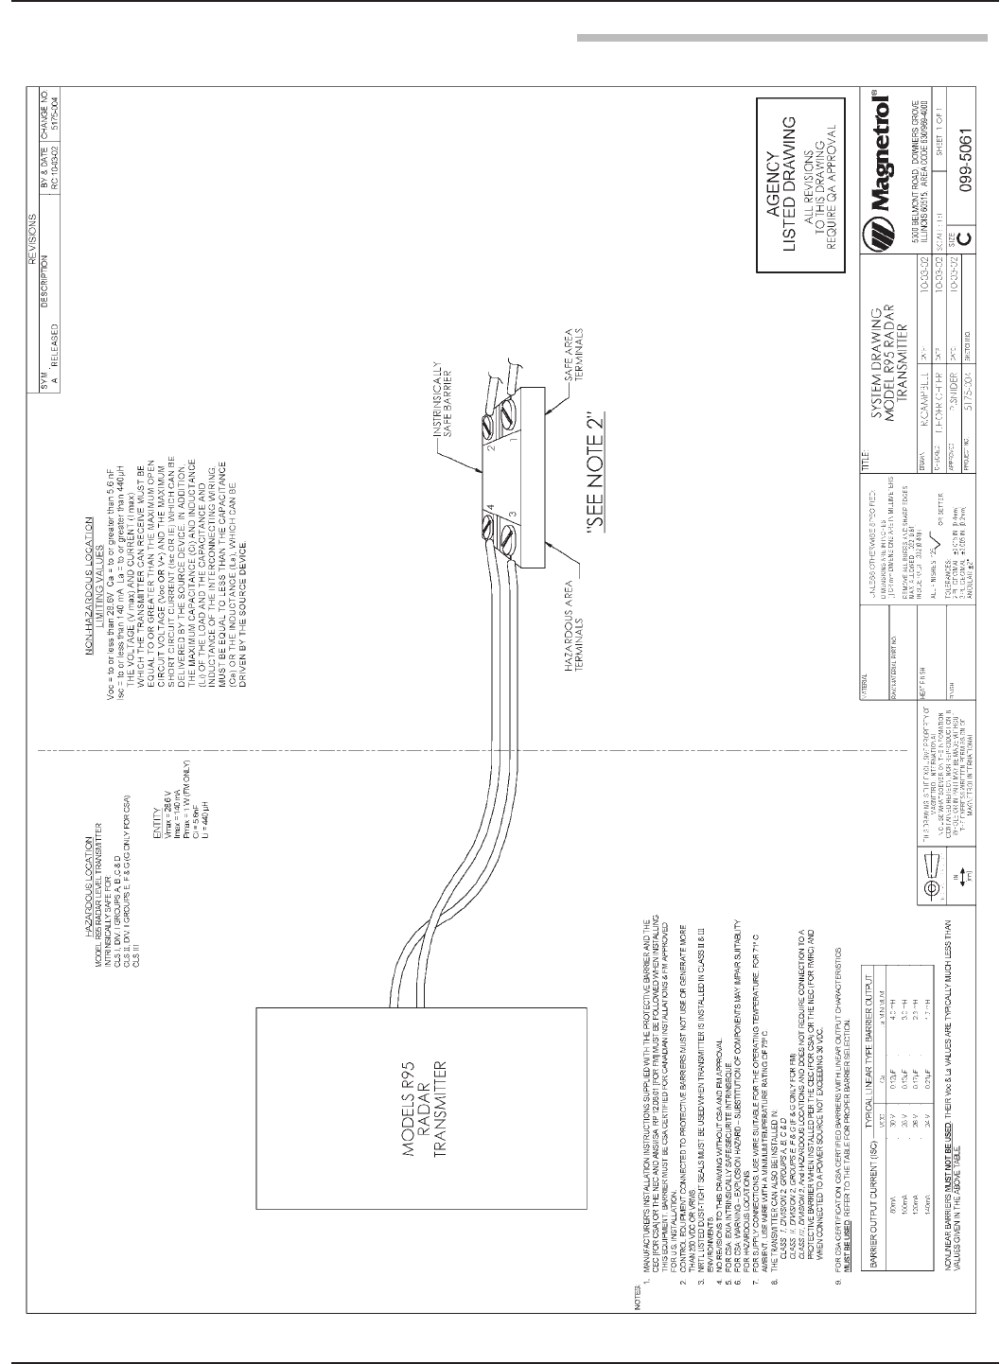 medium resolution of asv wiring diagram wiring libraryasv rc 50 electrical schematic trusted wiring diagrams dynatek ignition wiring diagram